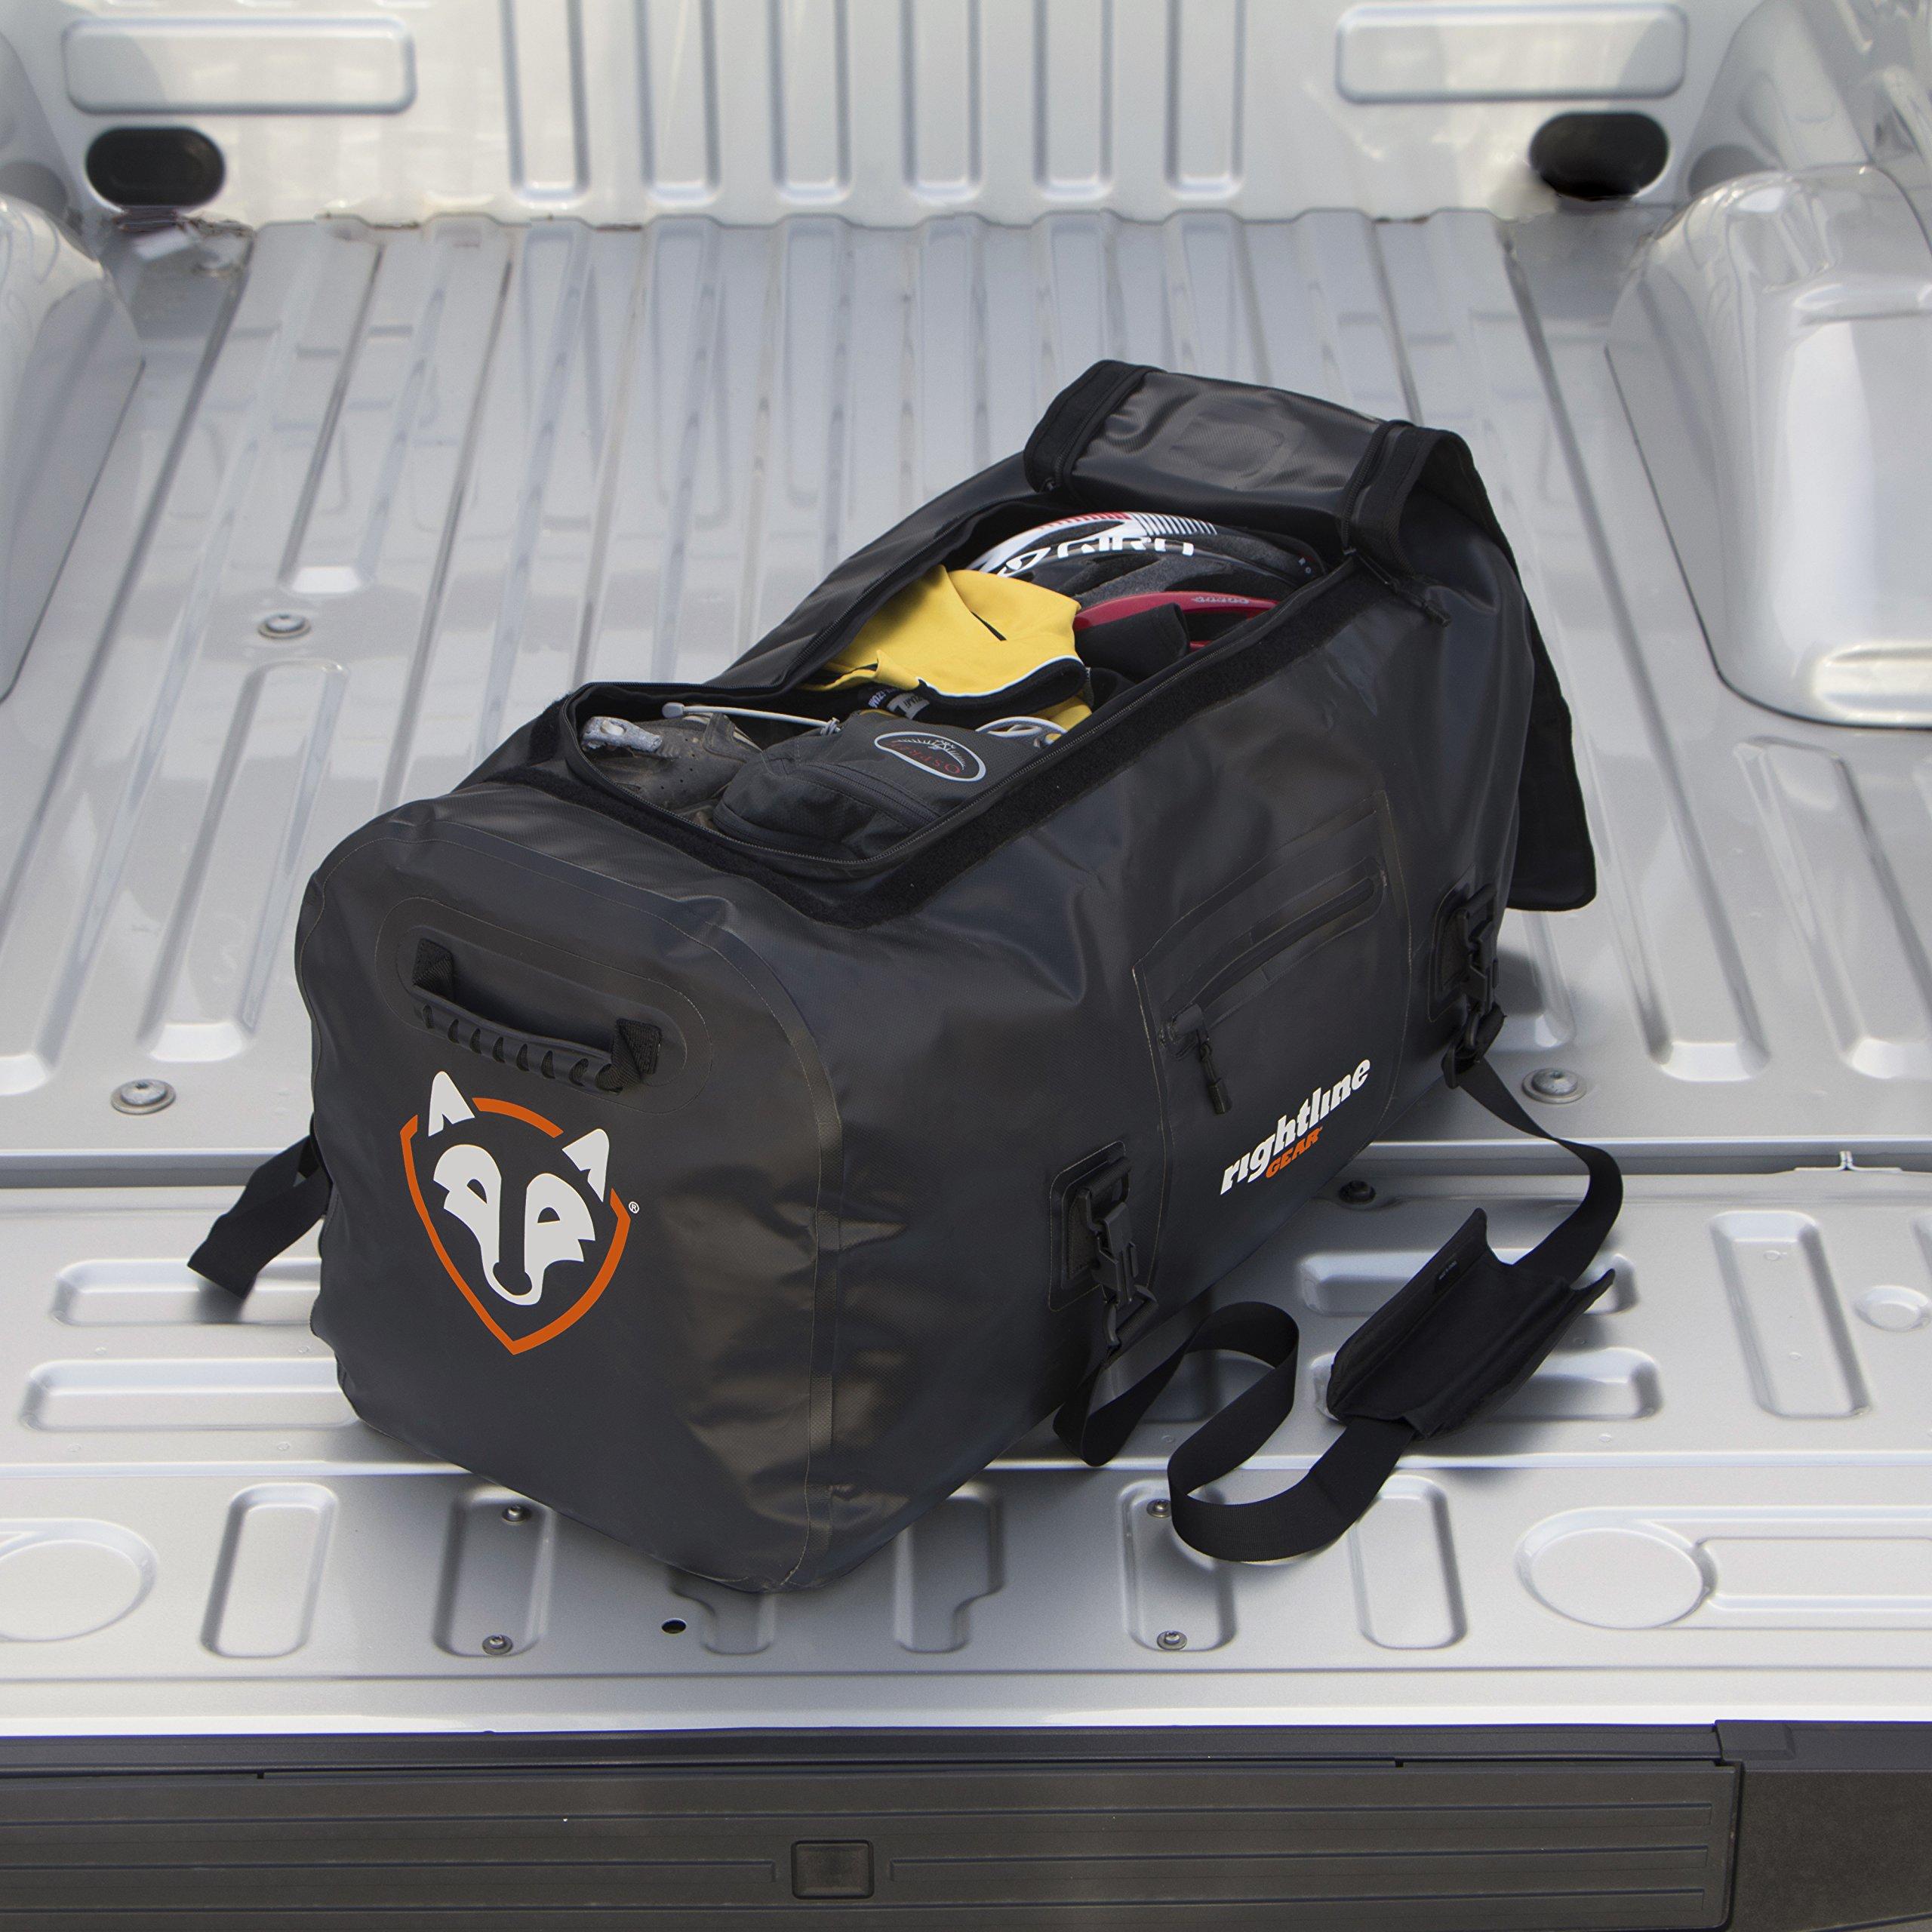 Rightline Gear 100J87-B 4x4 Duffle Bag (120L) by Rightline Gear (Image #2)